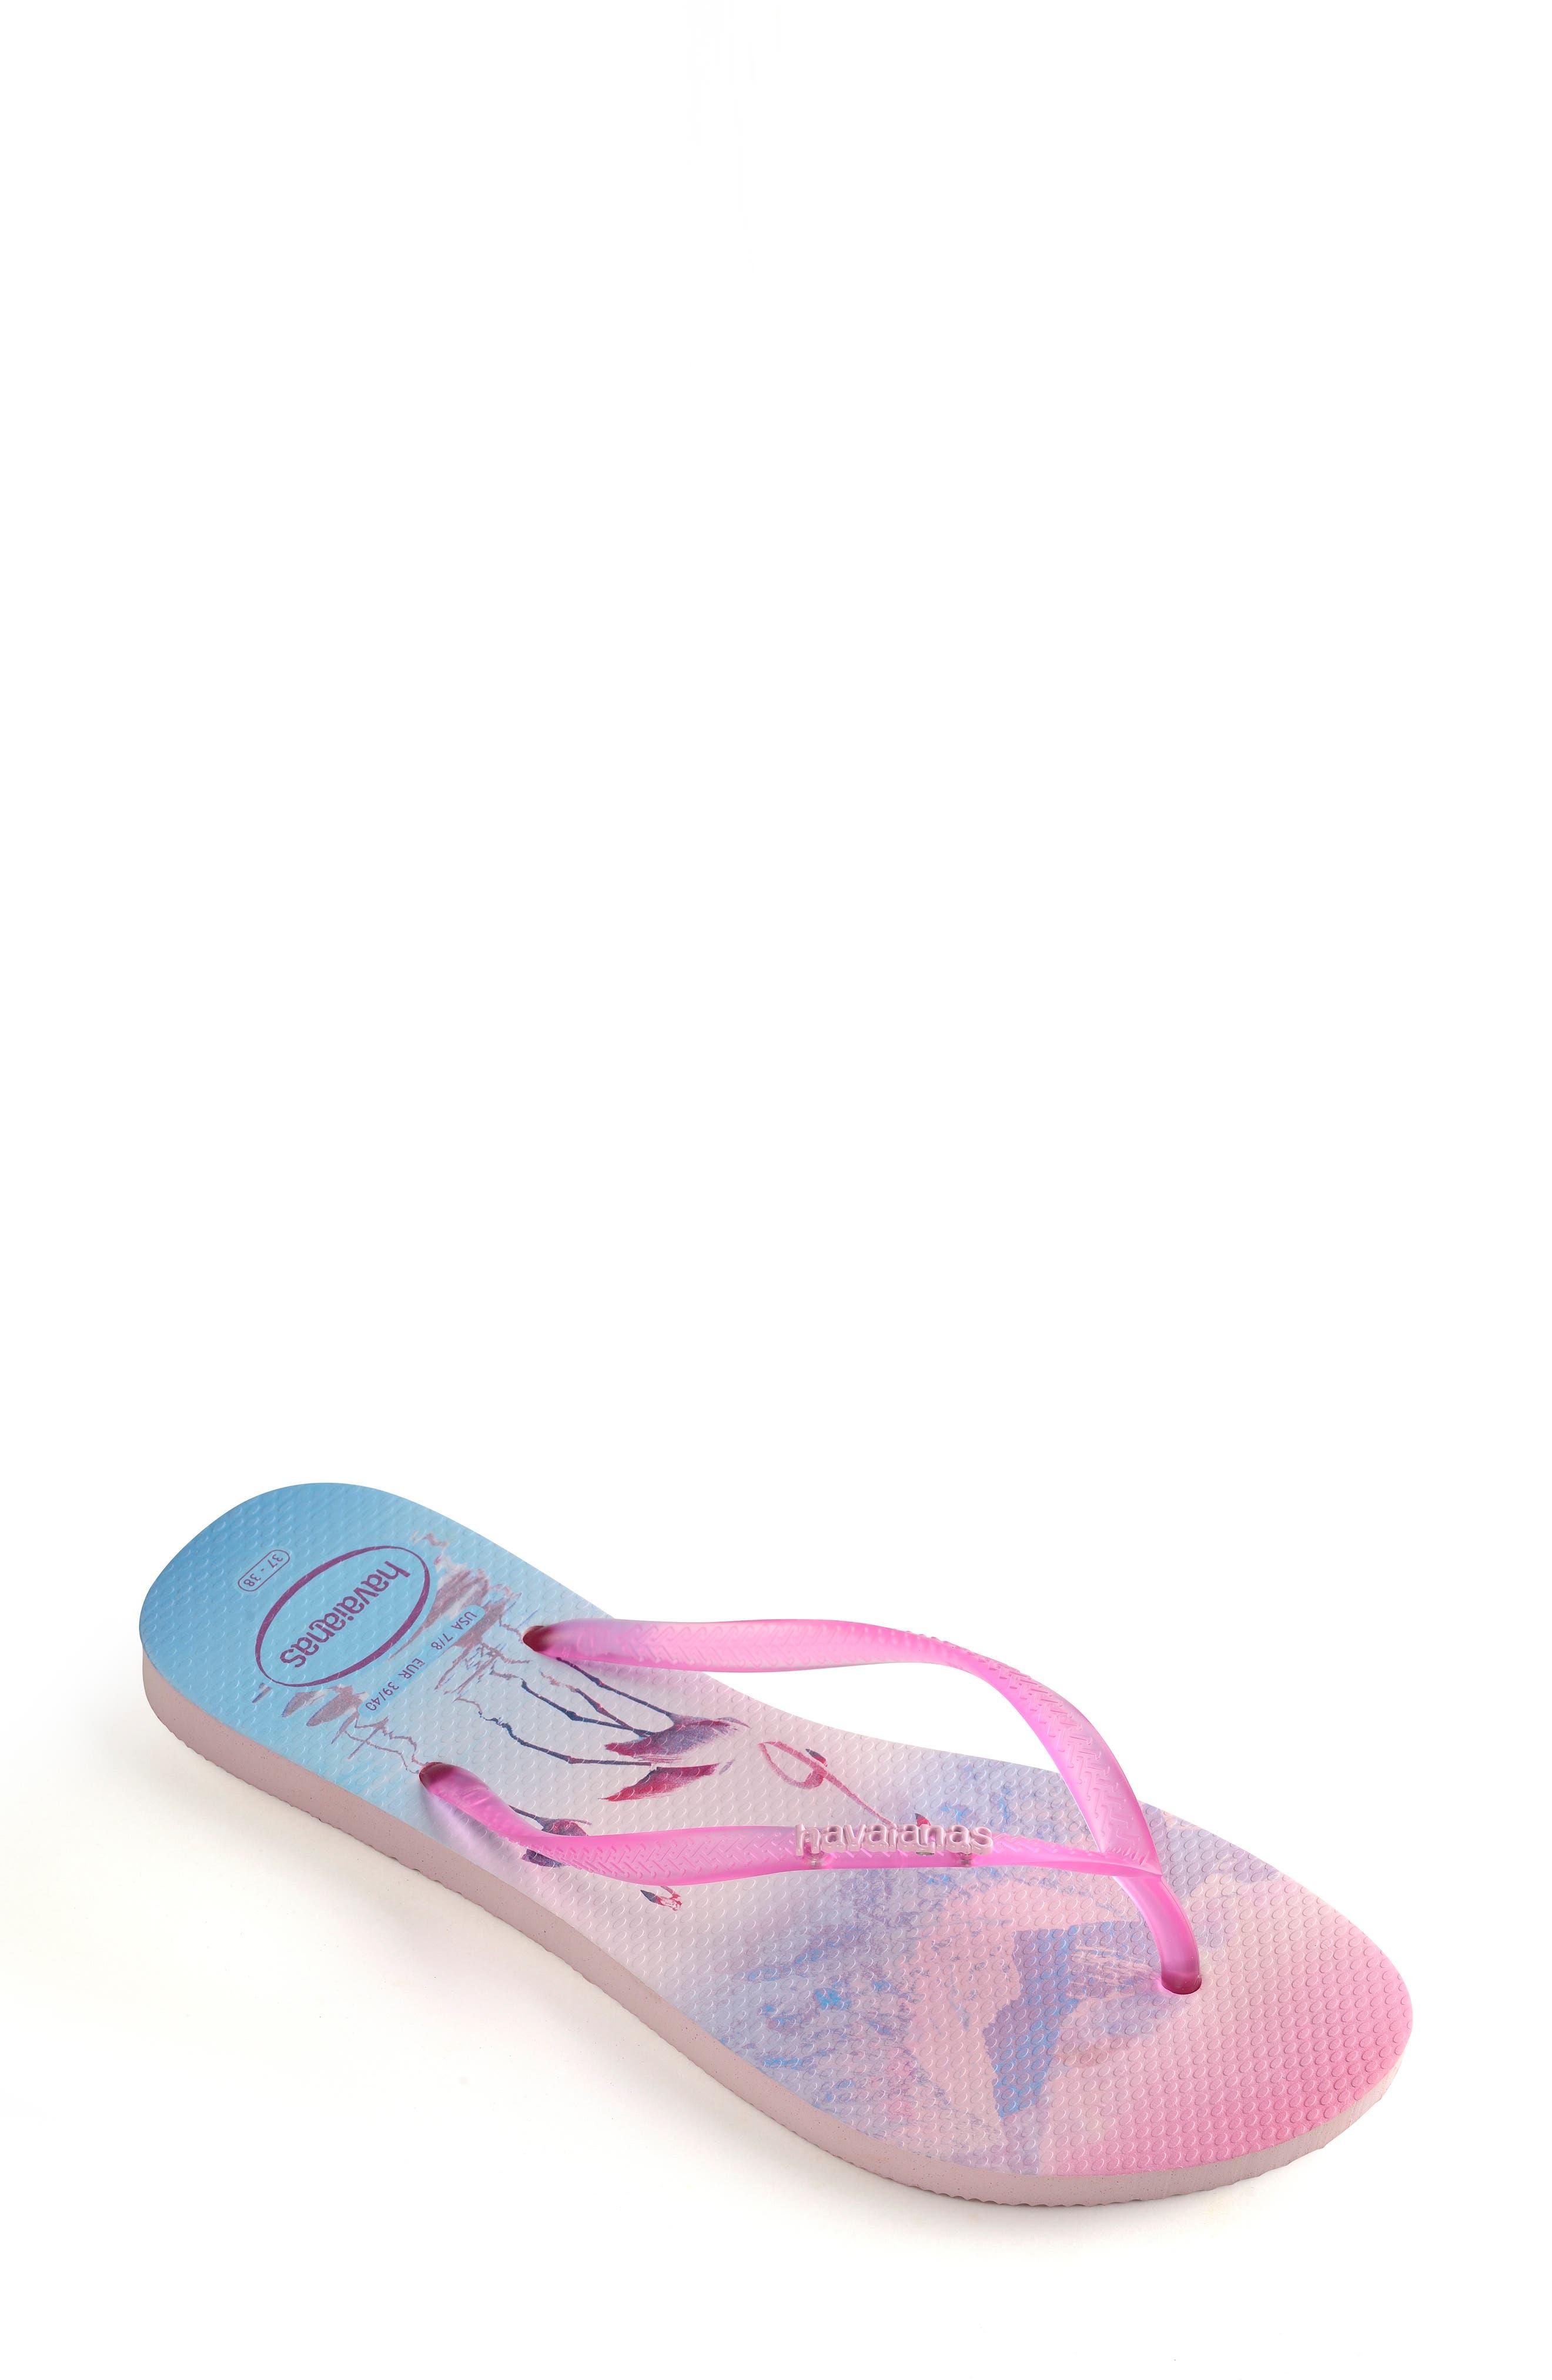 Image of Havaianas Slim Paisage Flip Flop